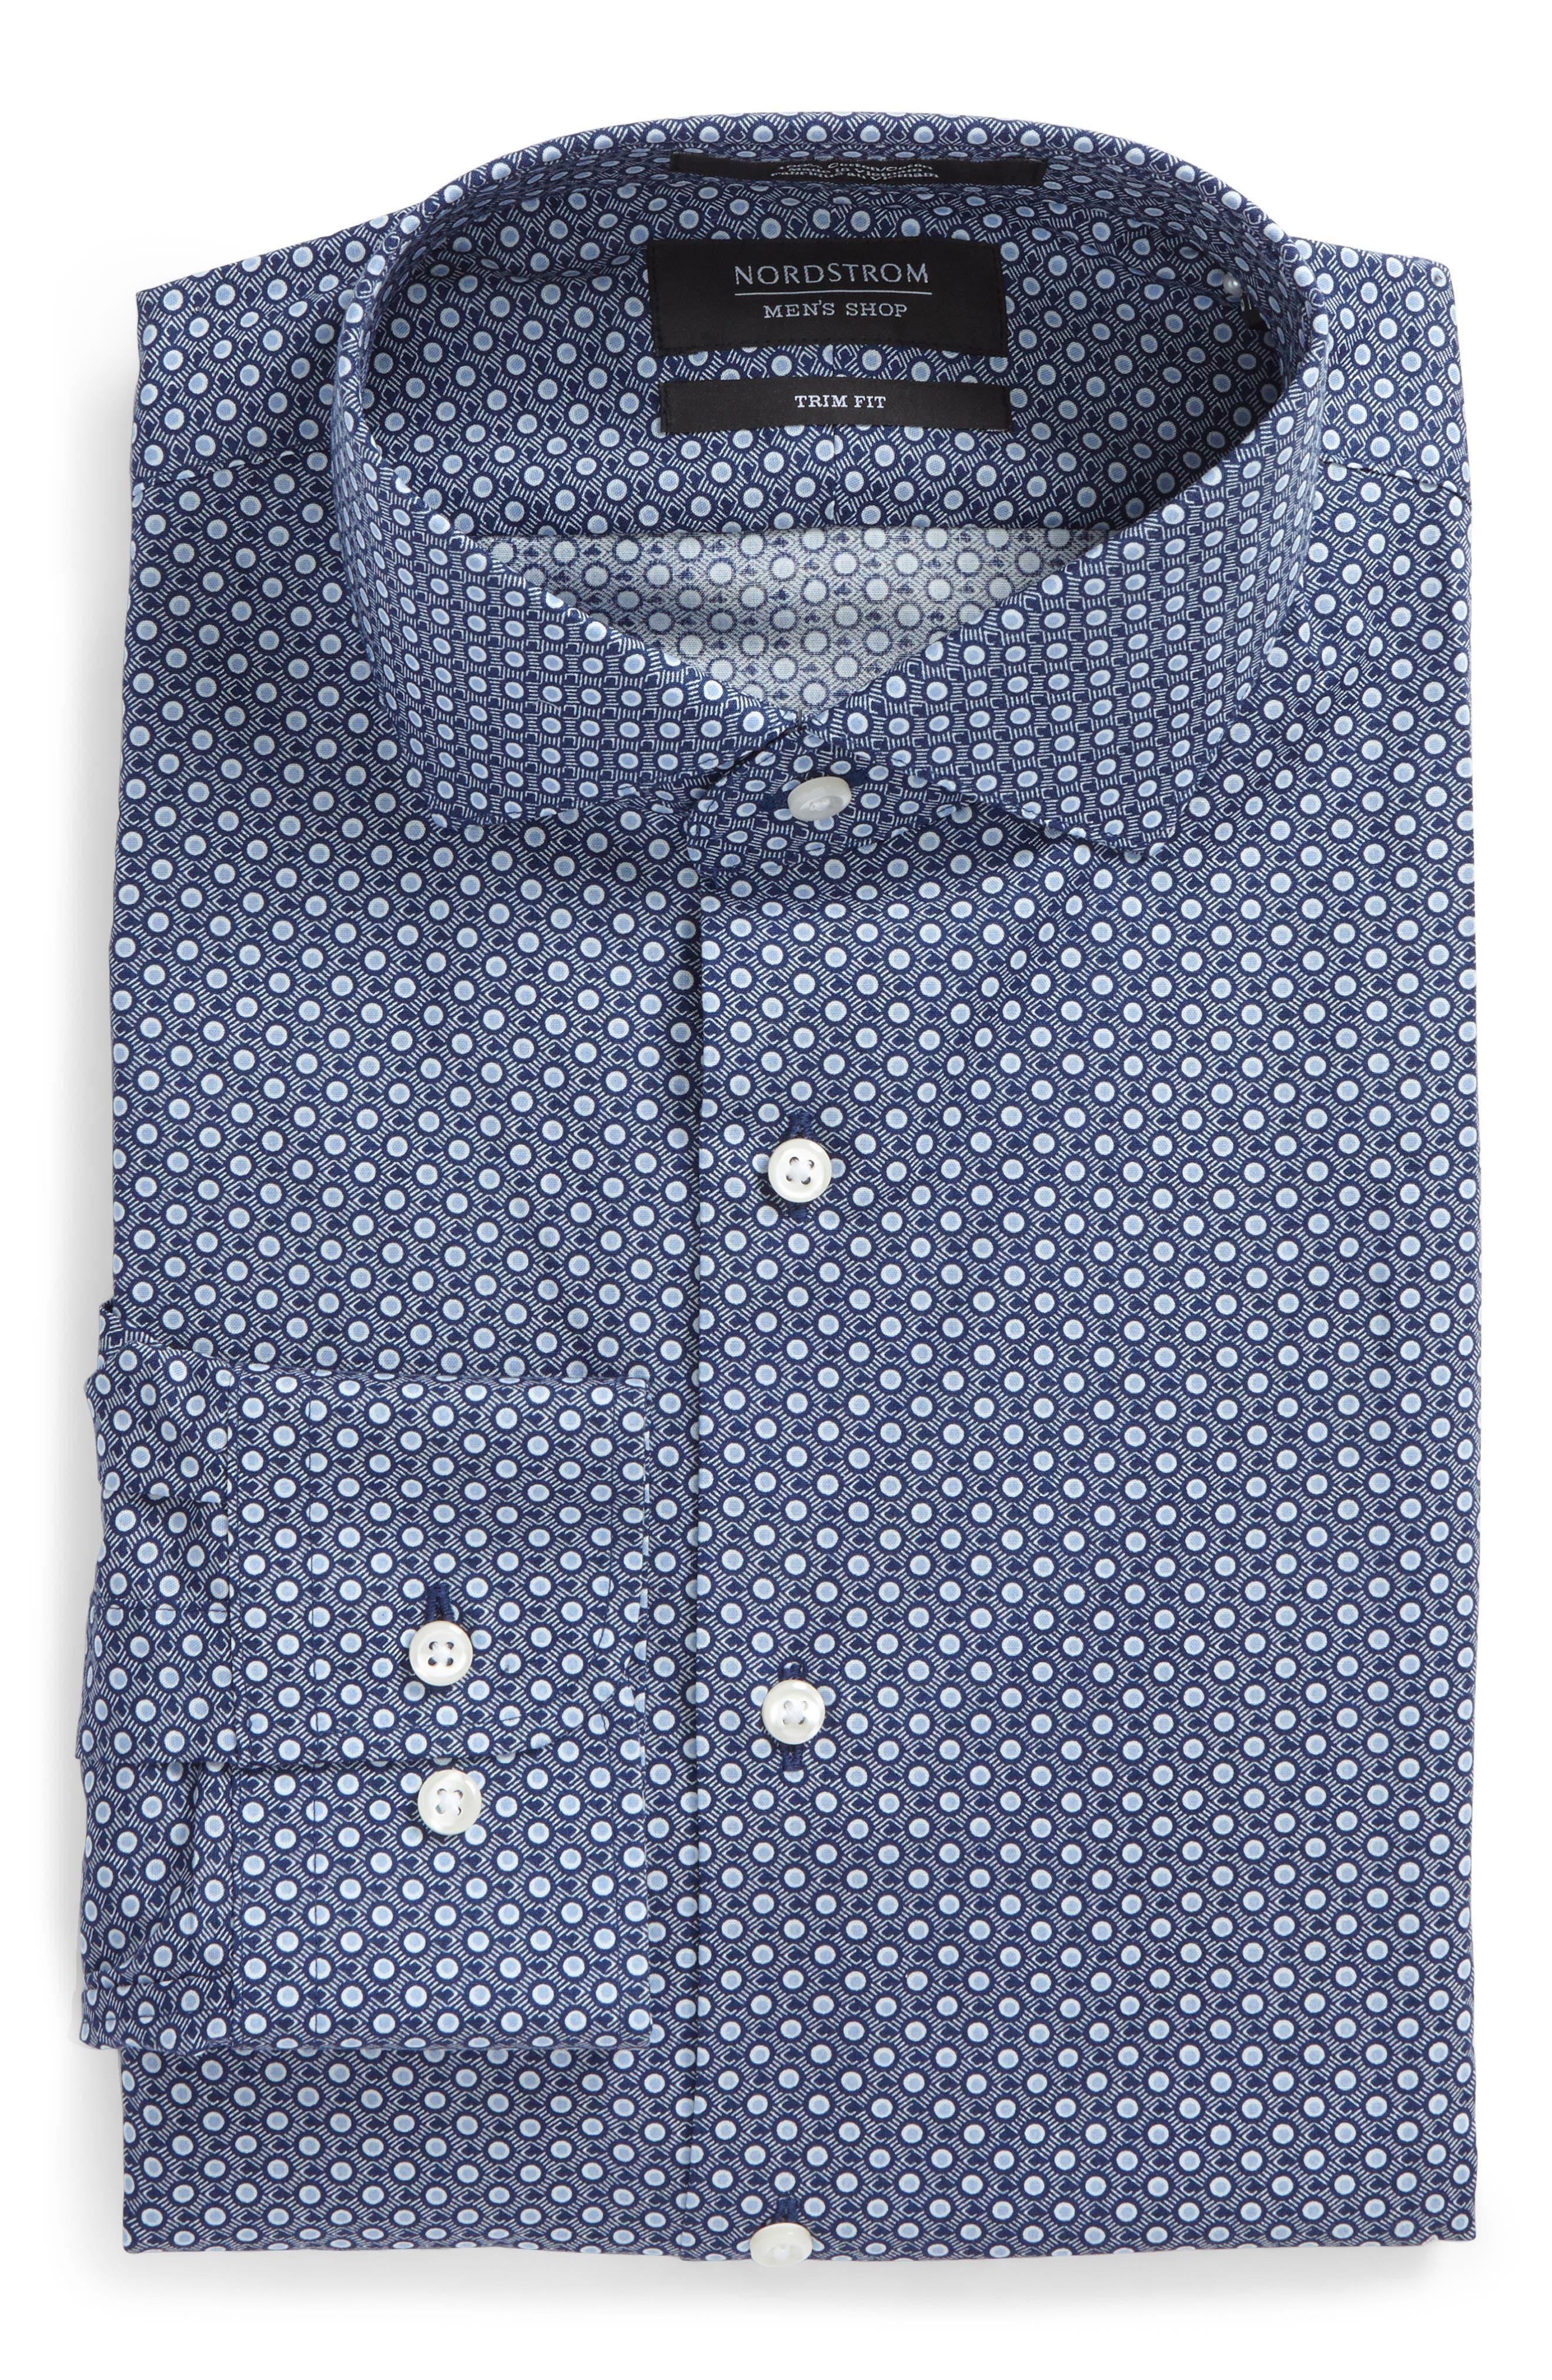 Main Image - Nordstrom Men's Shop Trim Fit Dress Shirt